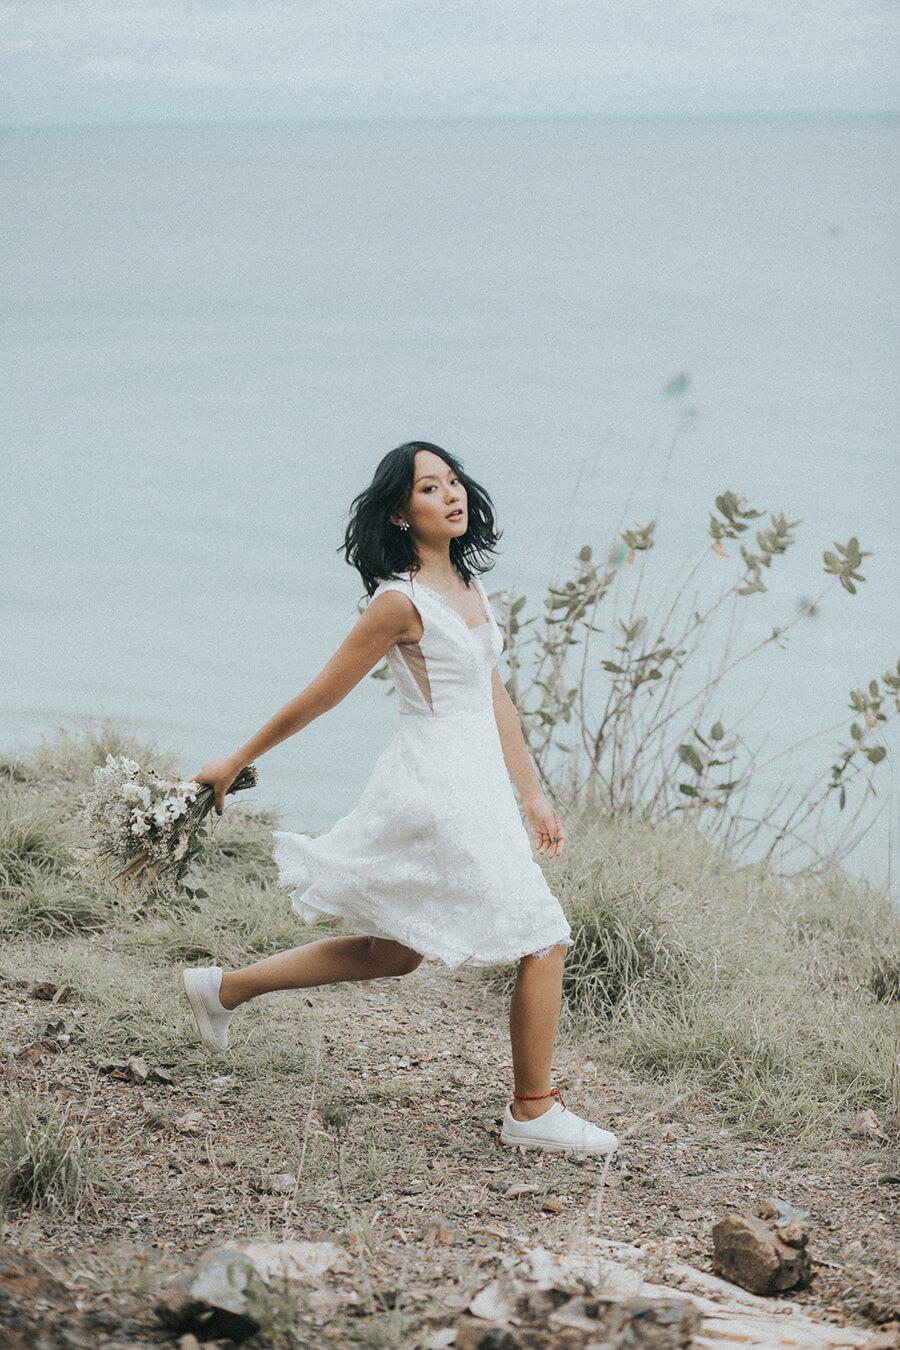 NW-001 - Luna Lace Dress